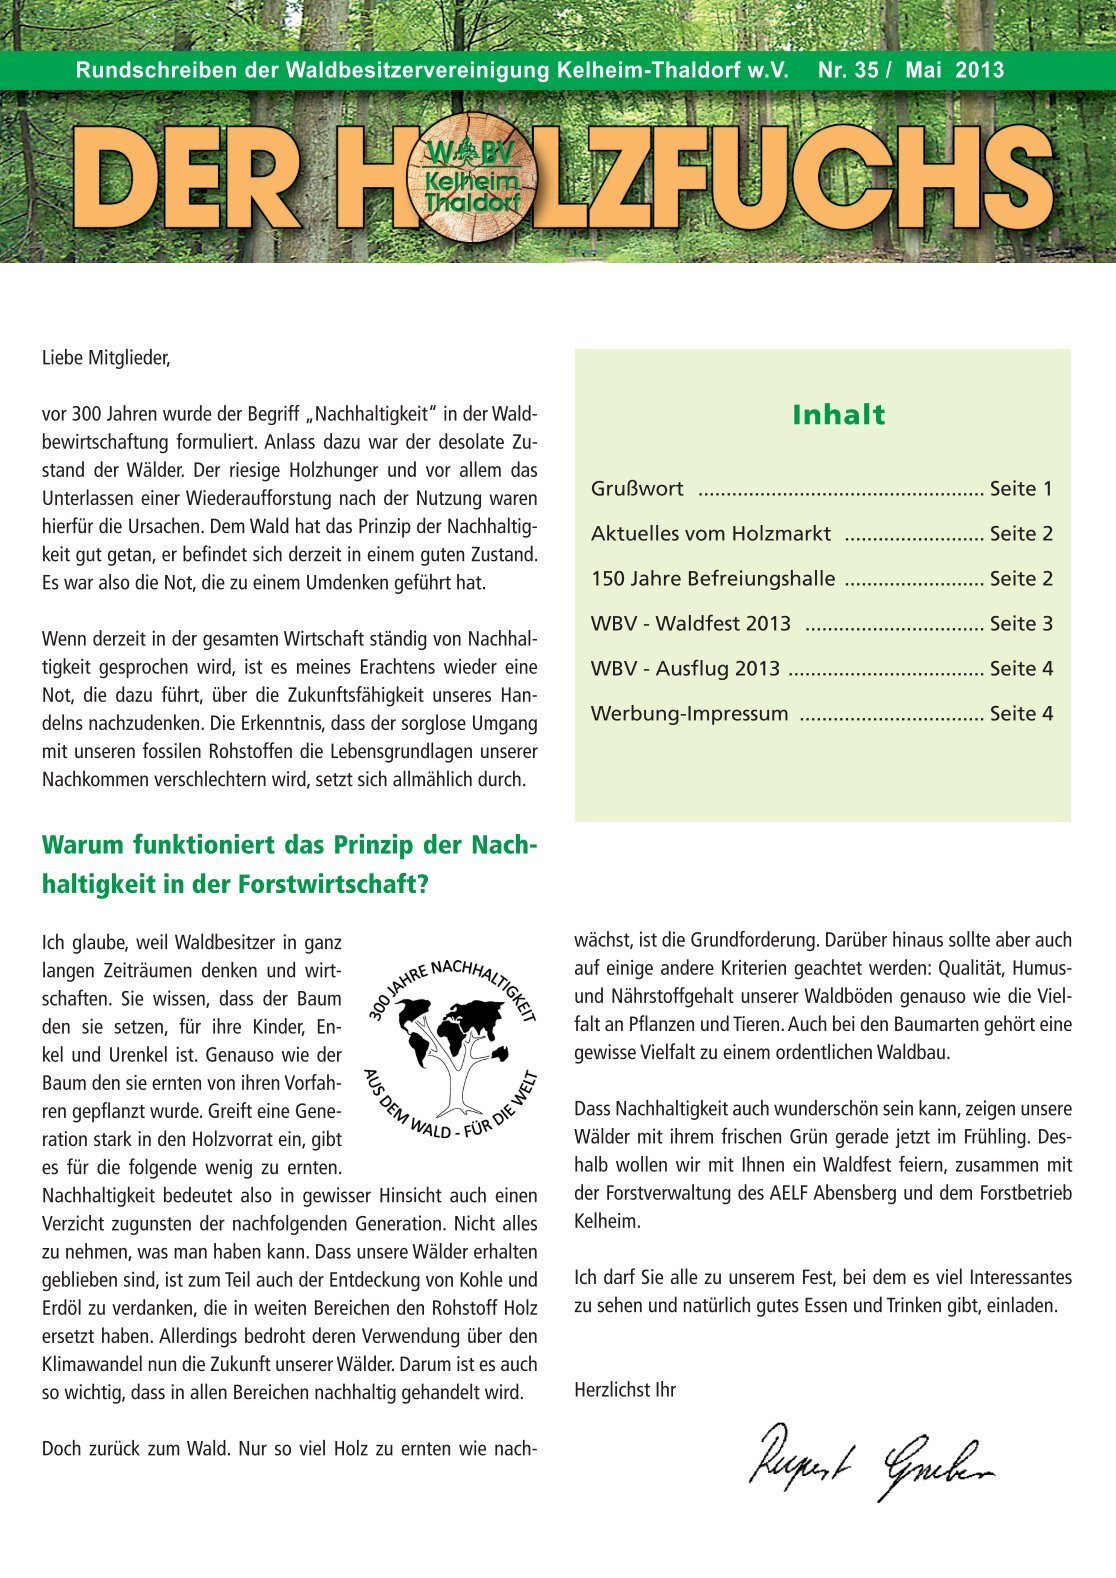 Tolle Aktuelles Stil Format Ideen - Entry Level Resume Vorlagen ...